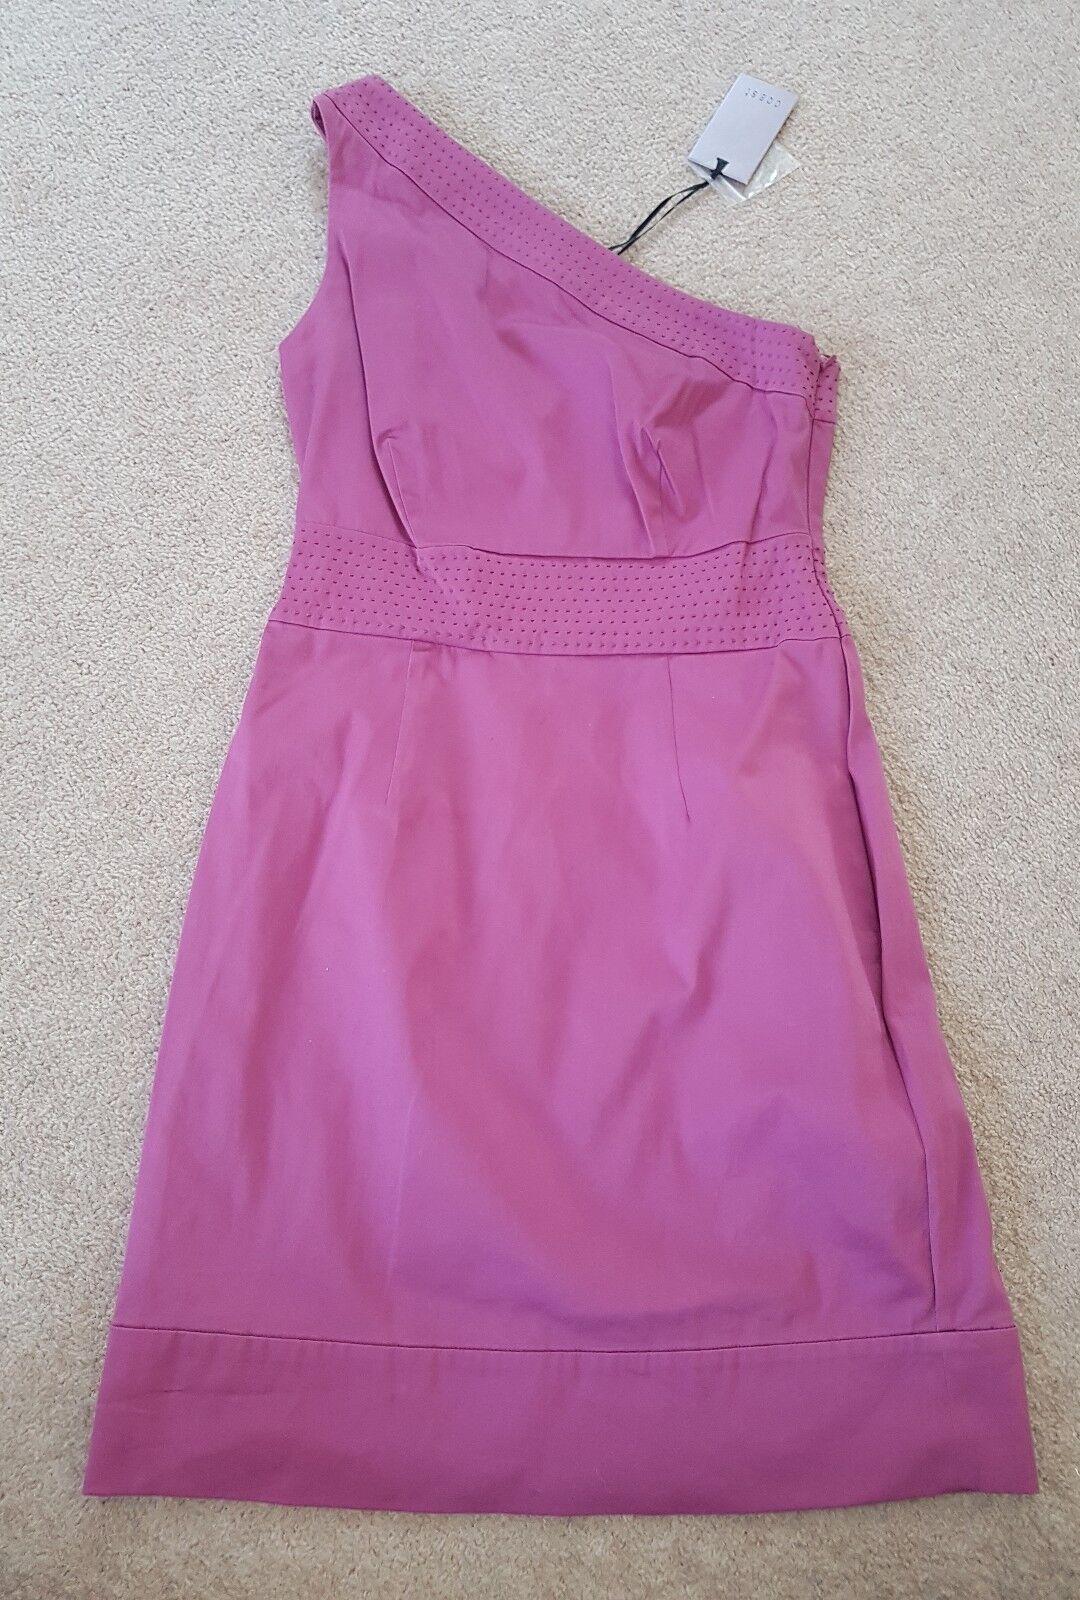 5495d5b798b Coast One Pink Dress Shoulder nascps21298-Dresses - www ...